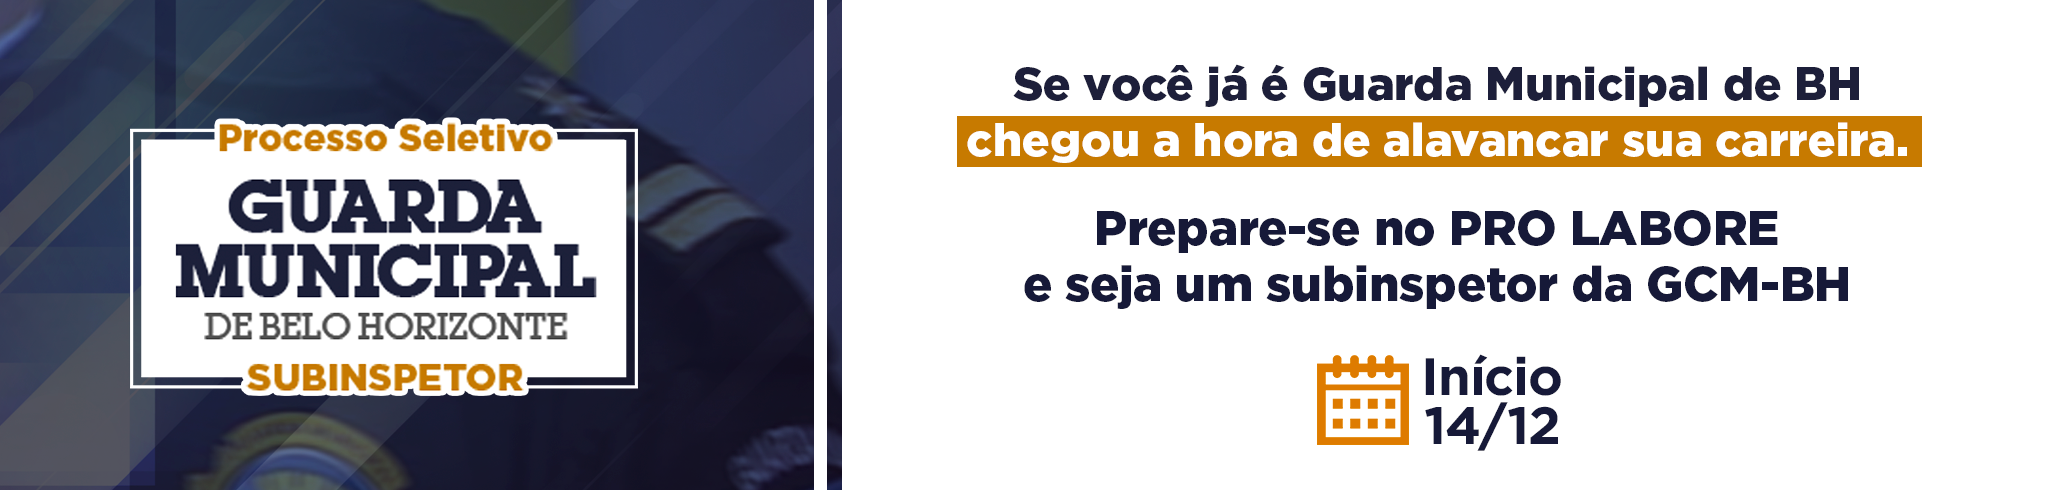 Guarda Municipal de Belo Horizonte | Subinspetor